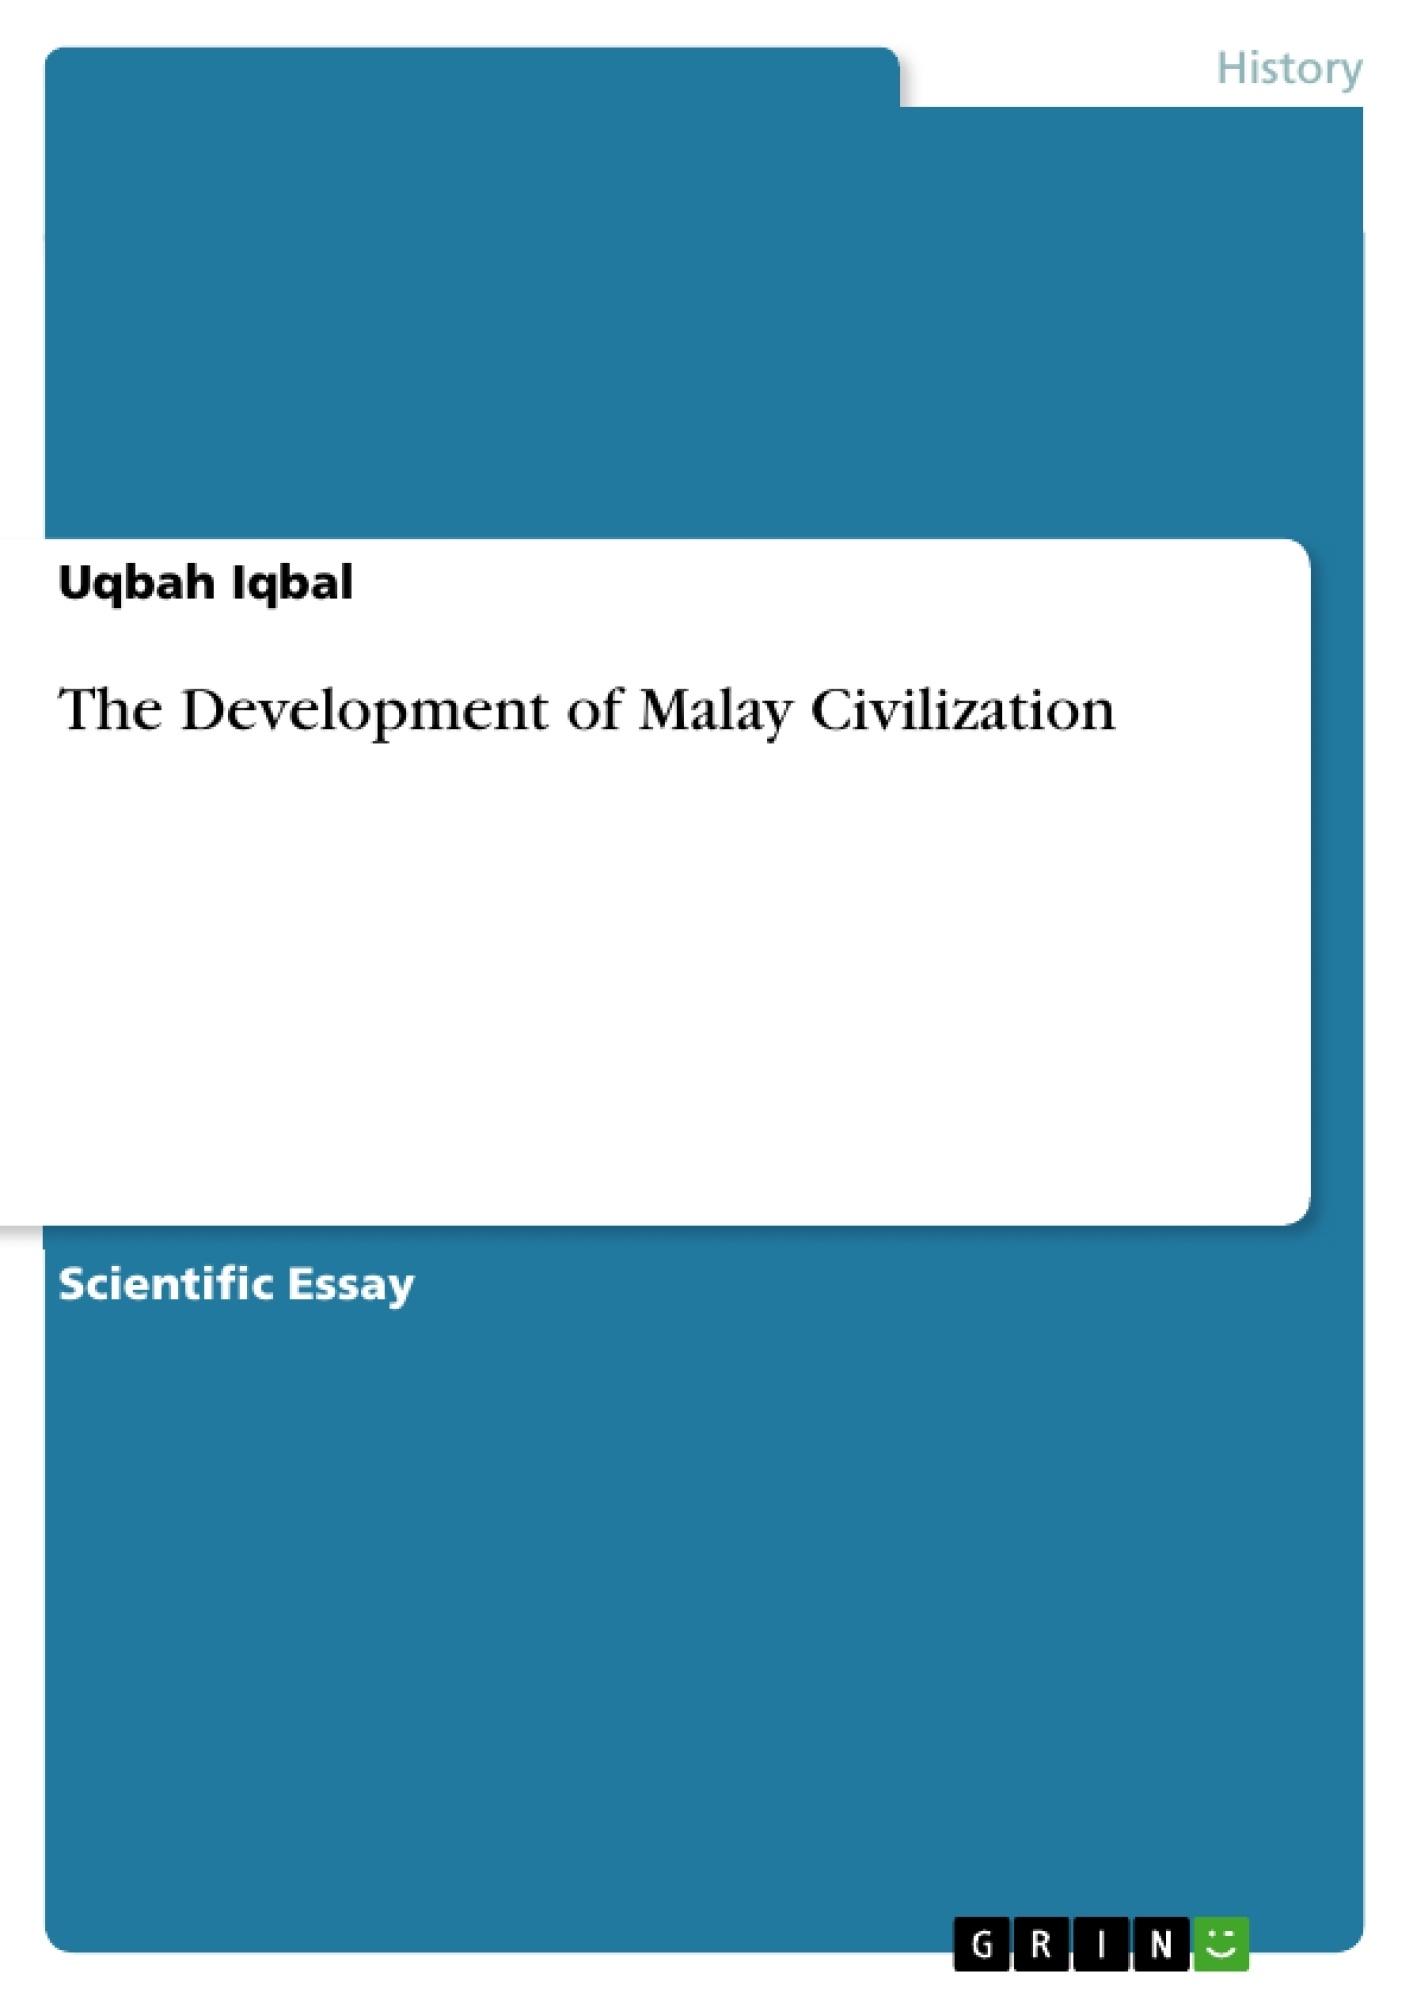 Title: The Development of Malay Civilization